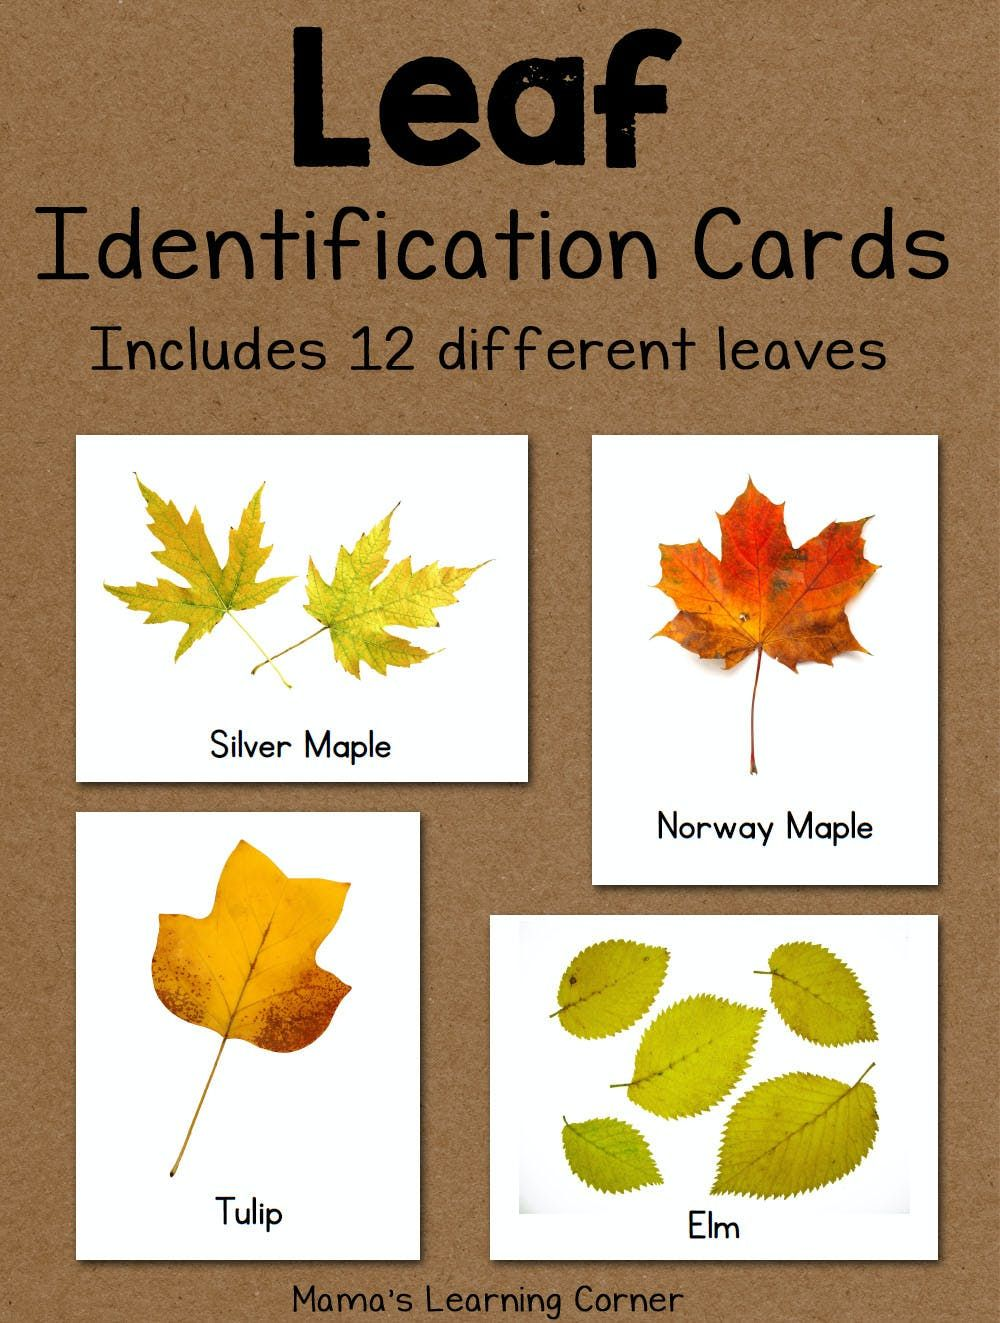 Leaf Identification Cards In 2020 Leaf Identification Cards Leaf Identification Leaf Lessons